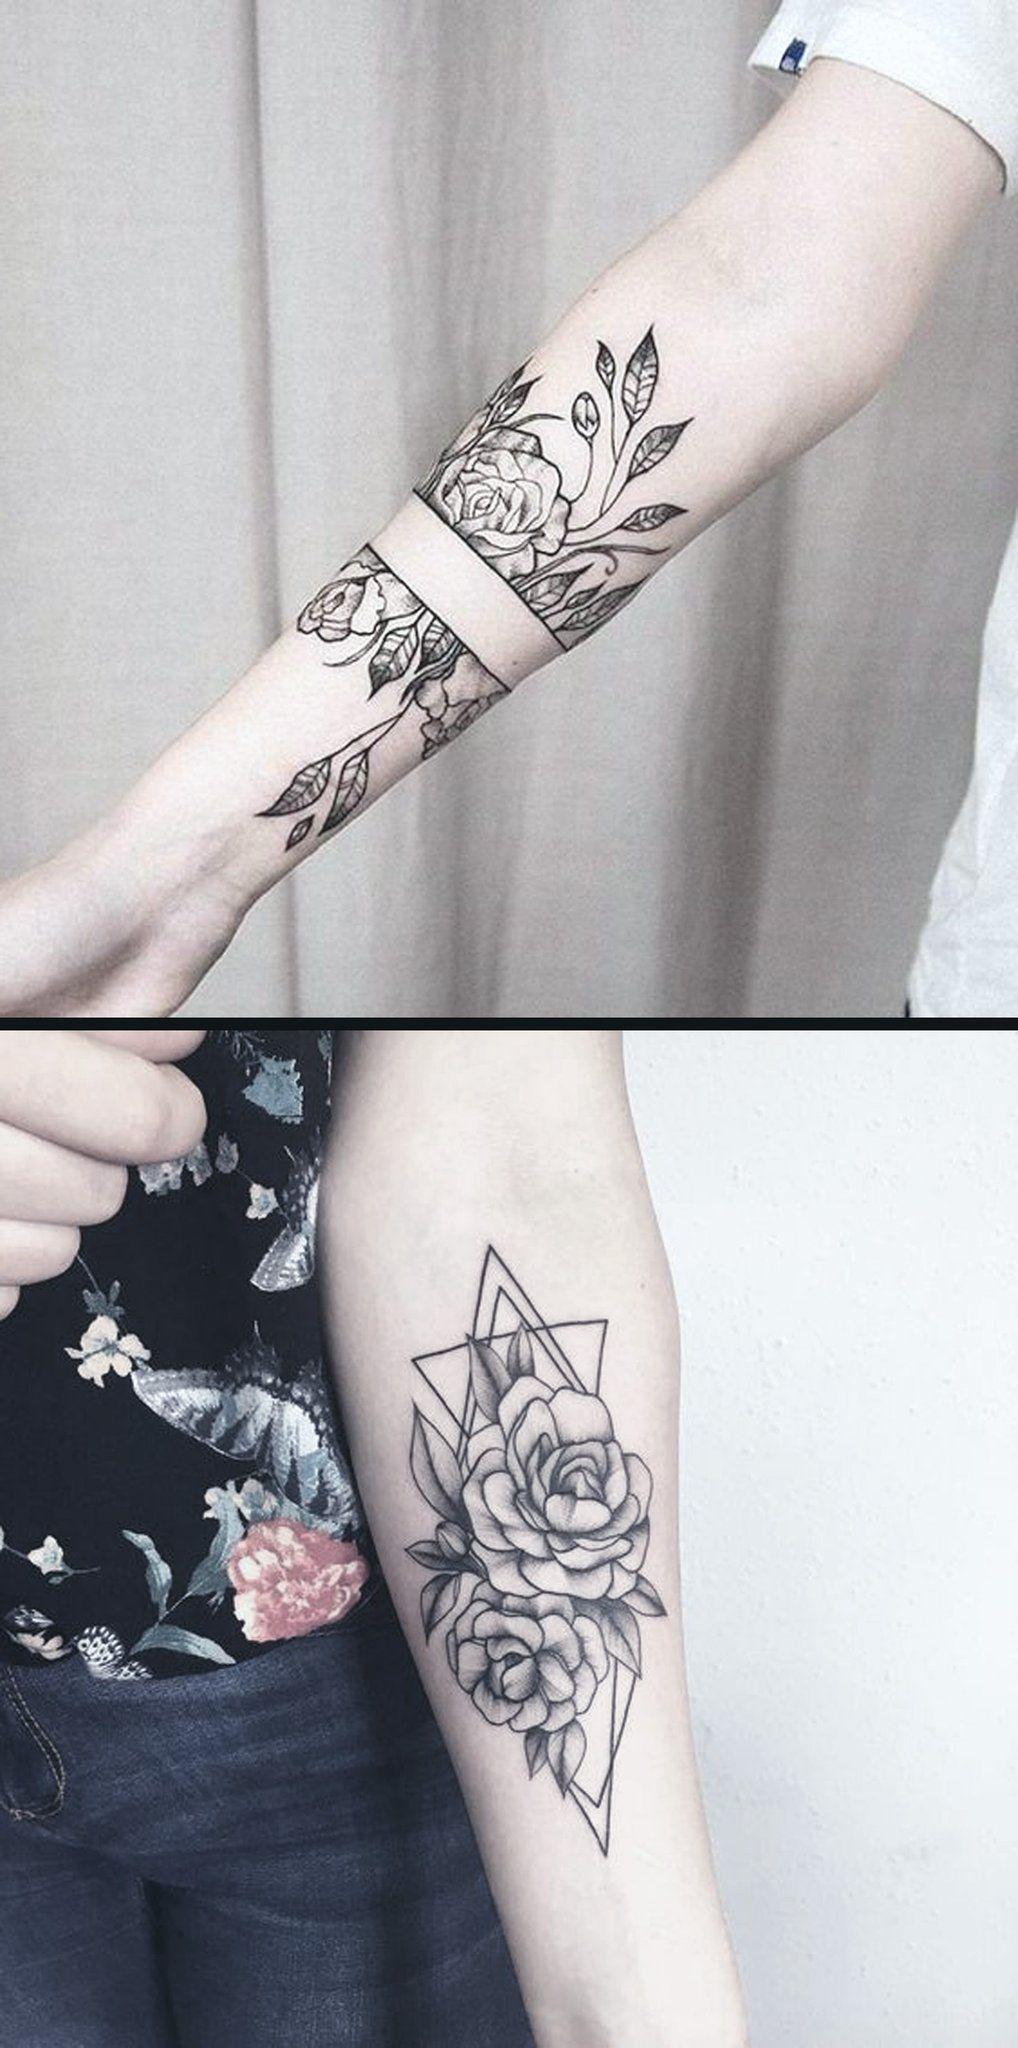 Geometric Diamond Rose Forearm Tattoo Ideas For Women Black Wild within sizing 1018 X 2048